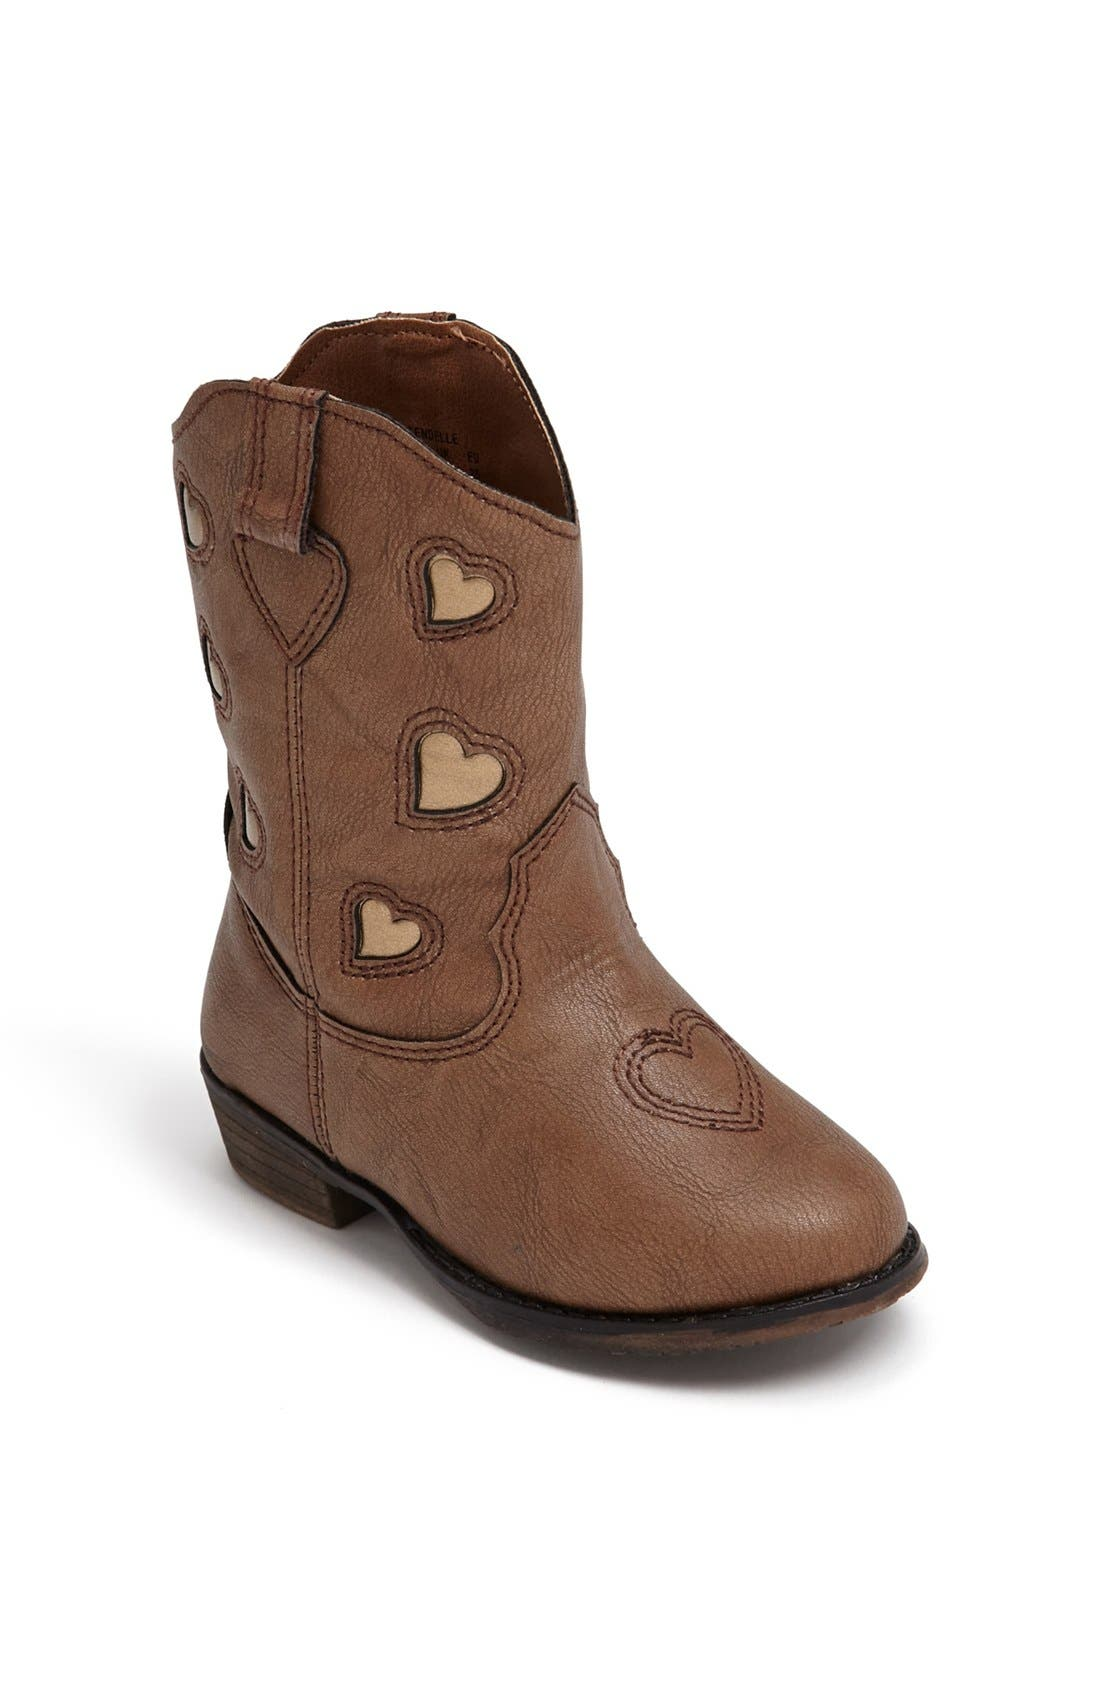 Alternate Image 1 Selected - Jessica Simpson 'Kendelle' Boot (Walker & Toddler)